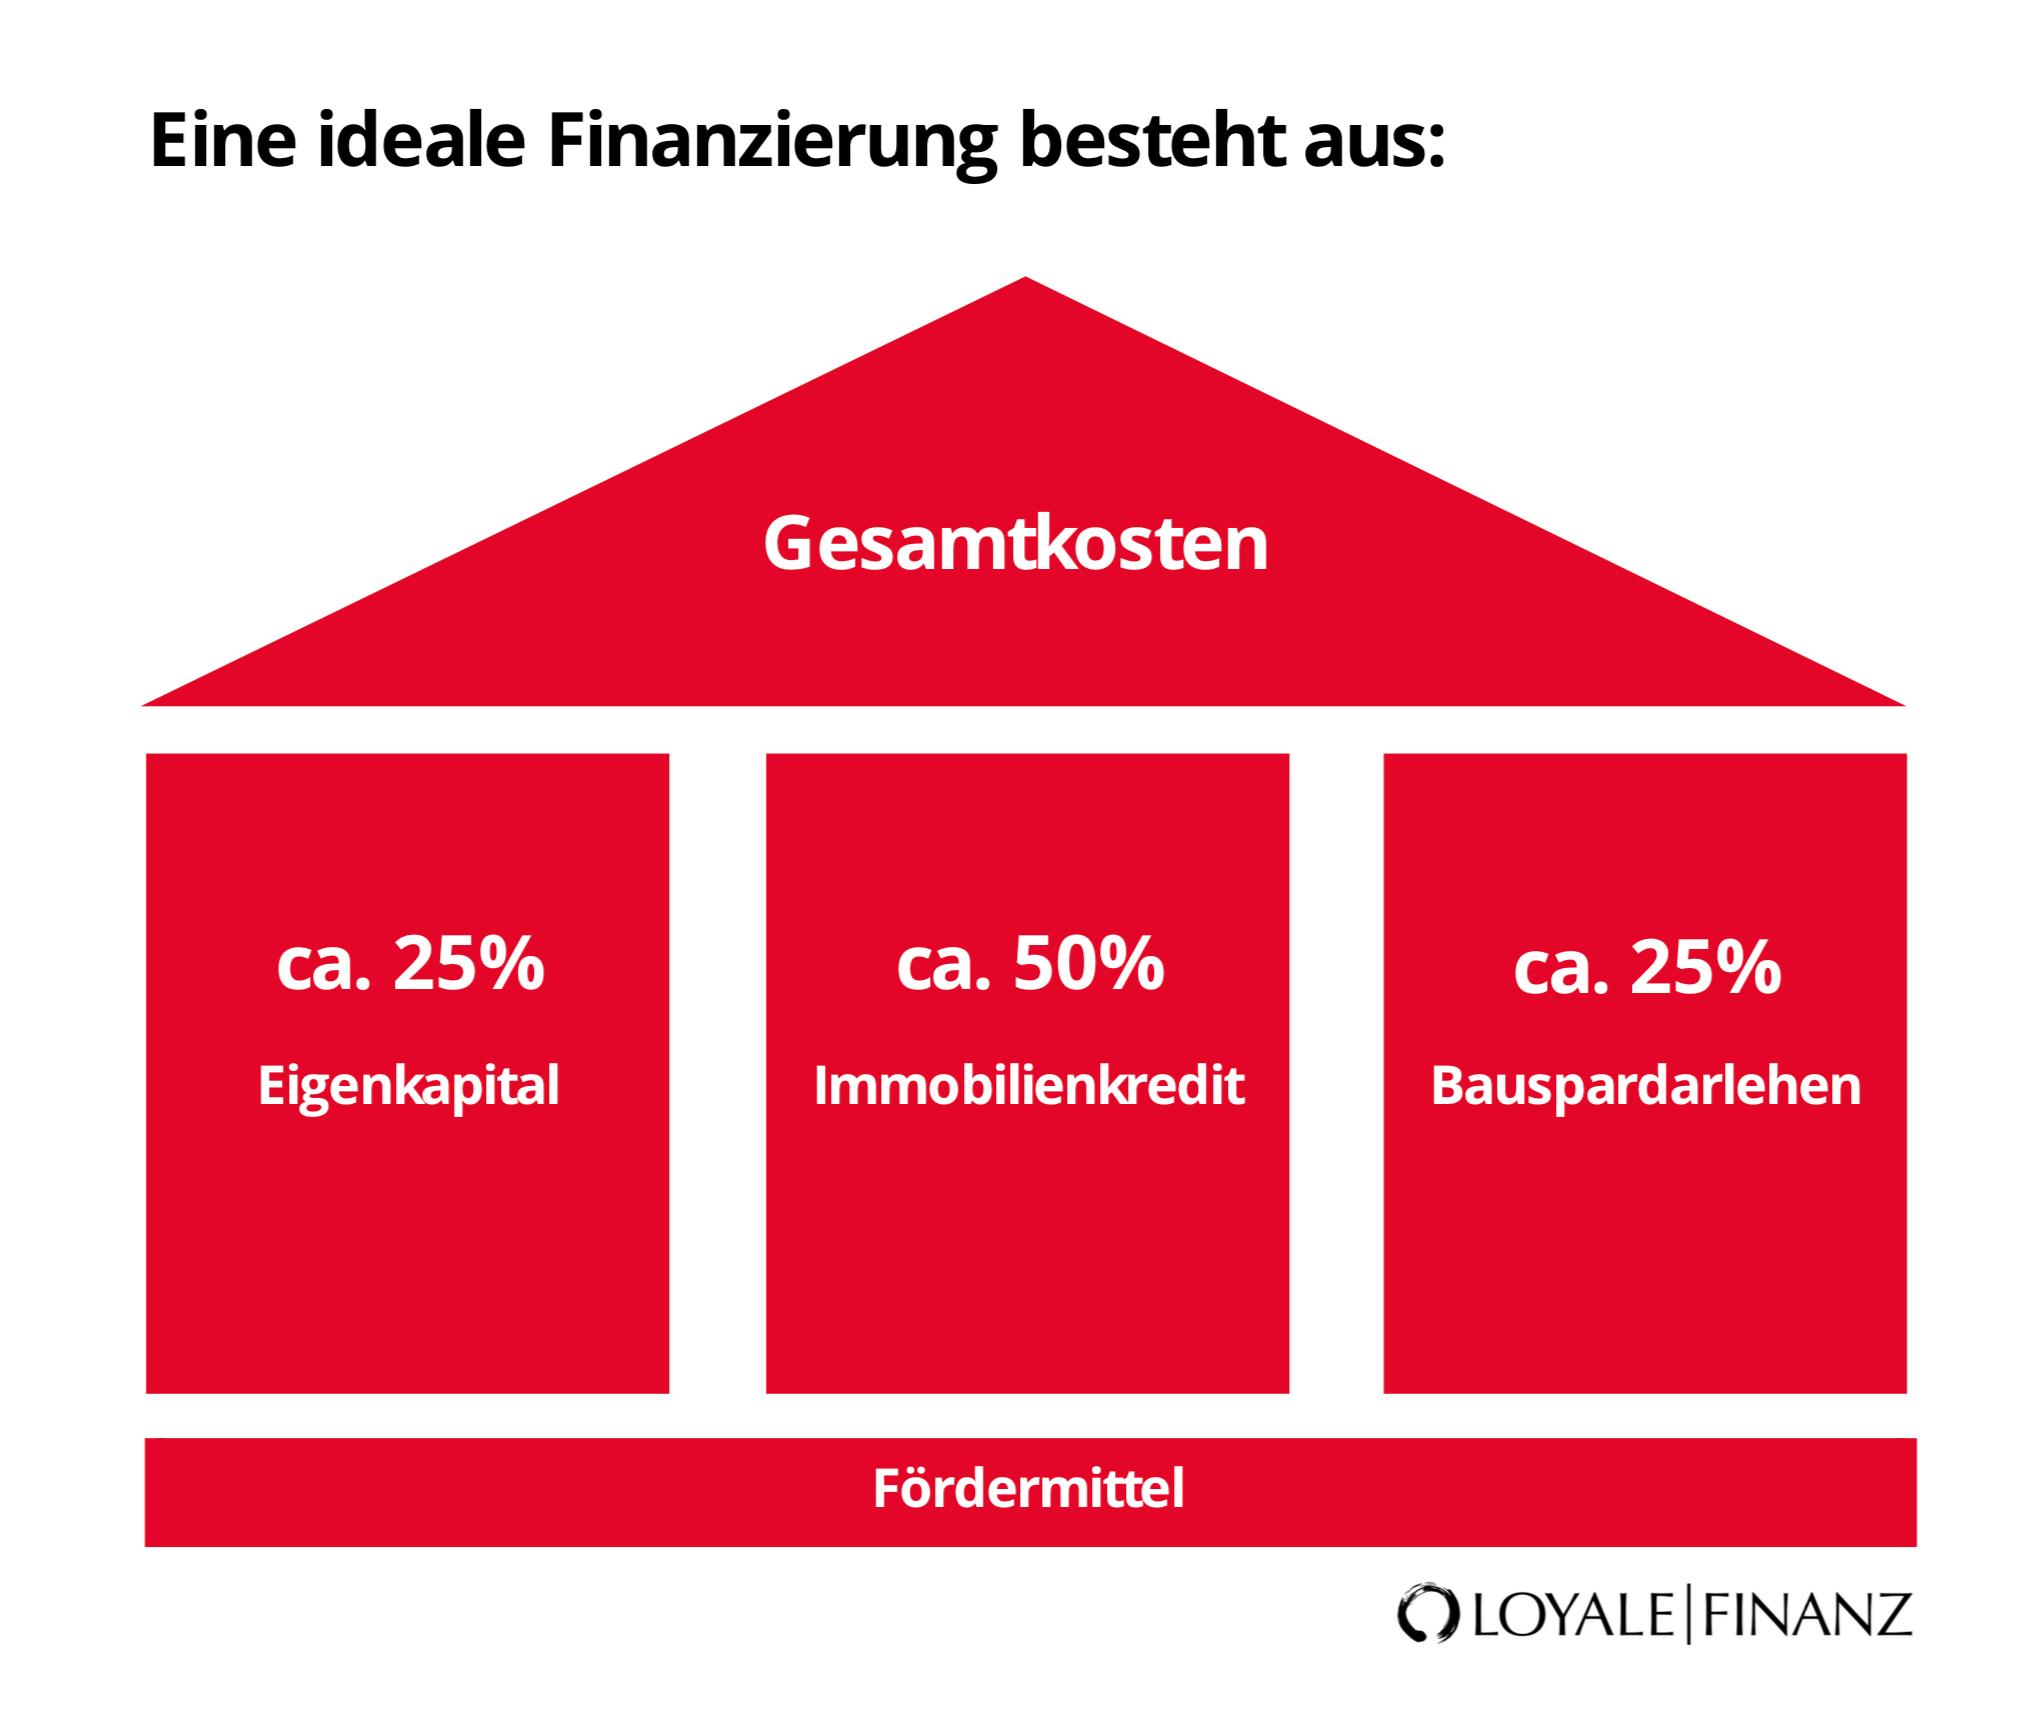 Ideale Finanzierung